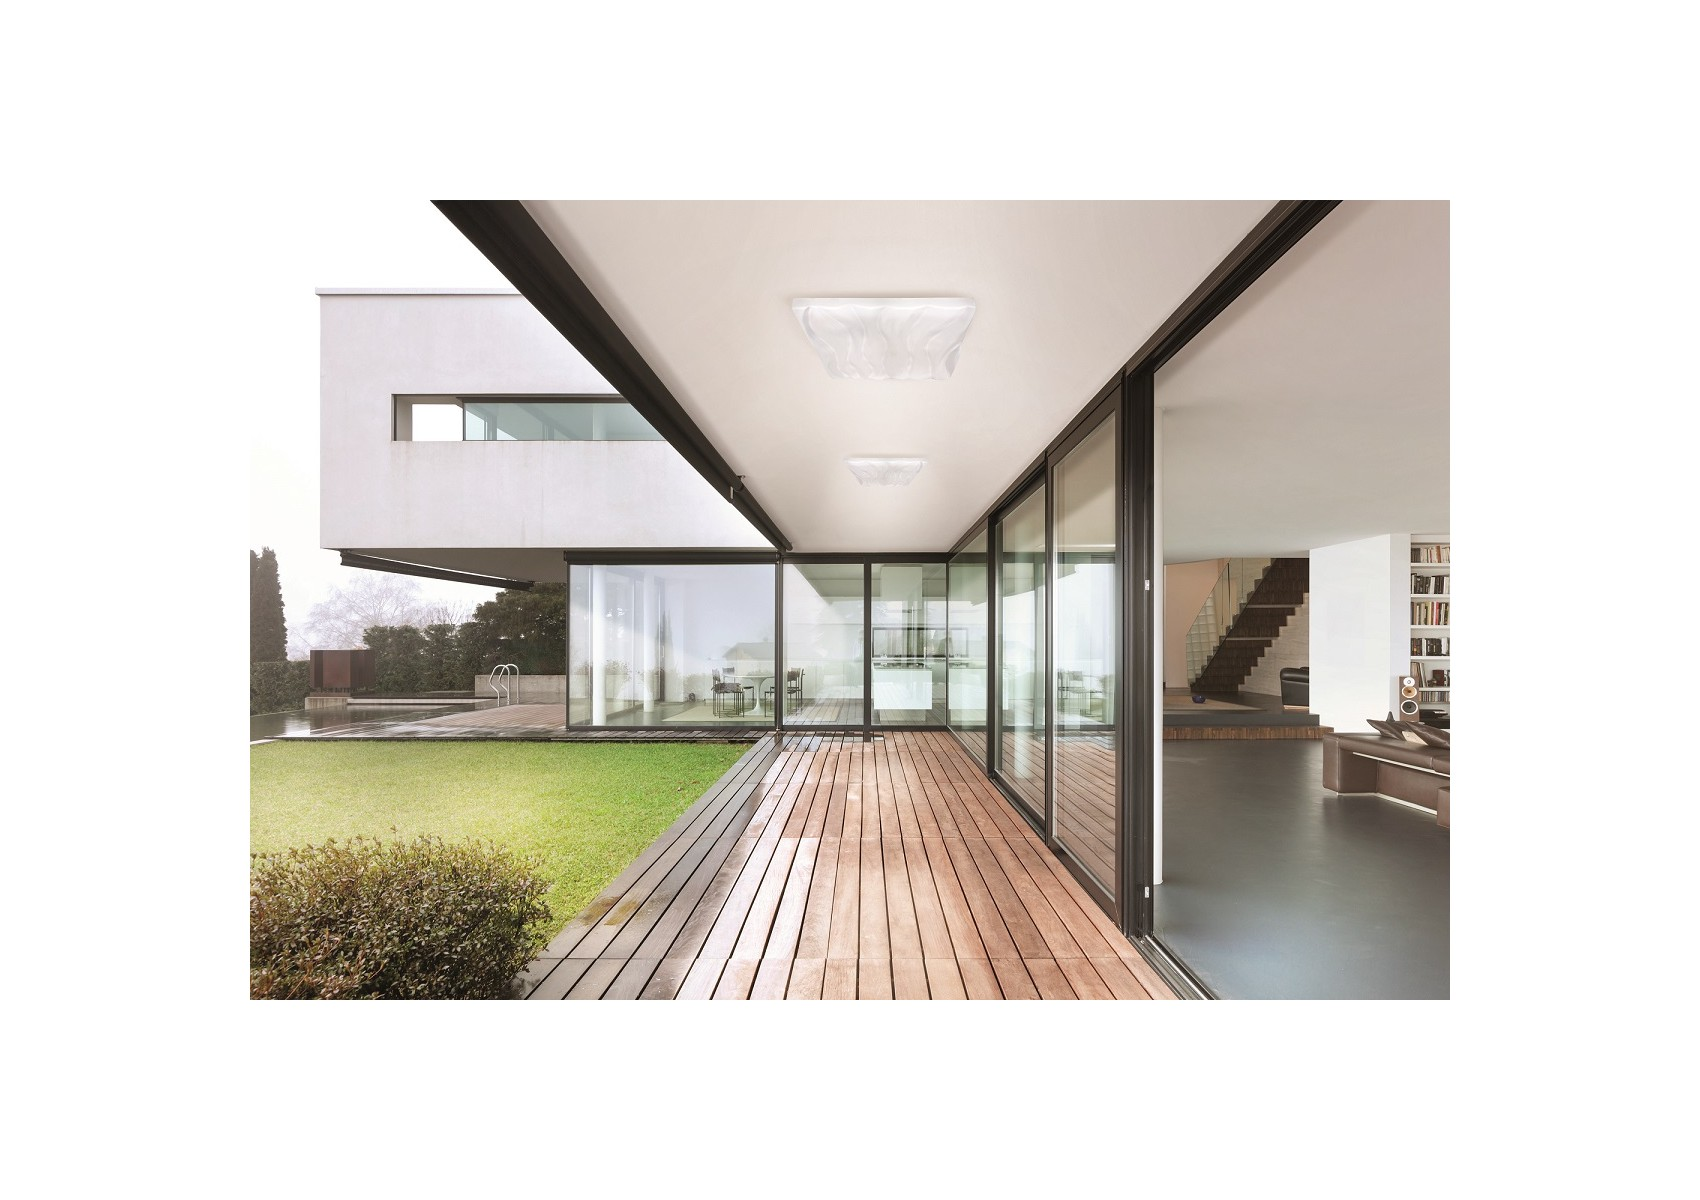 grand plafonnier exterieur design arena carr boite design